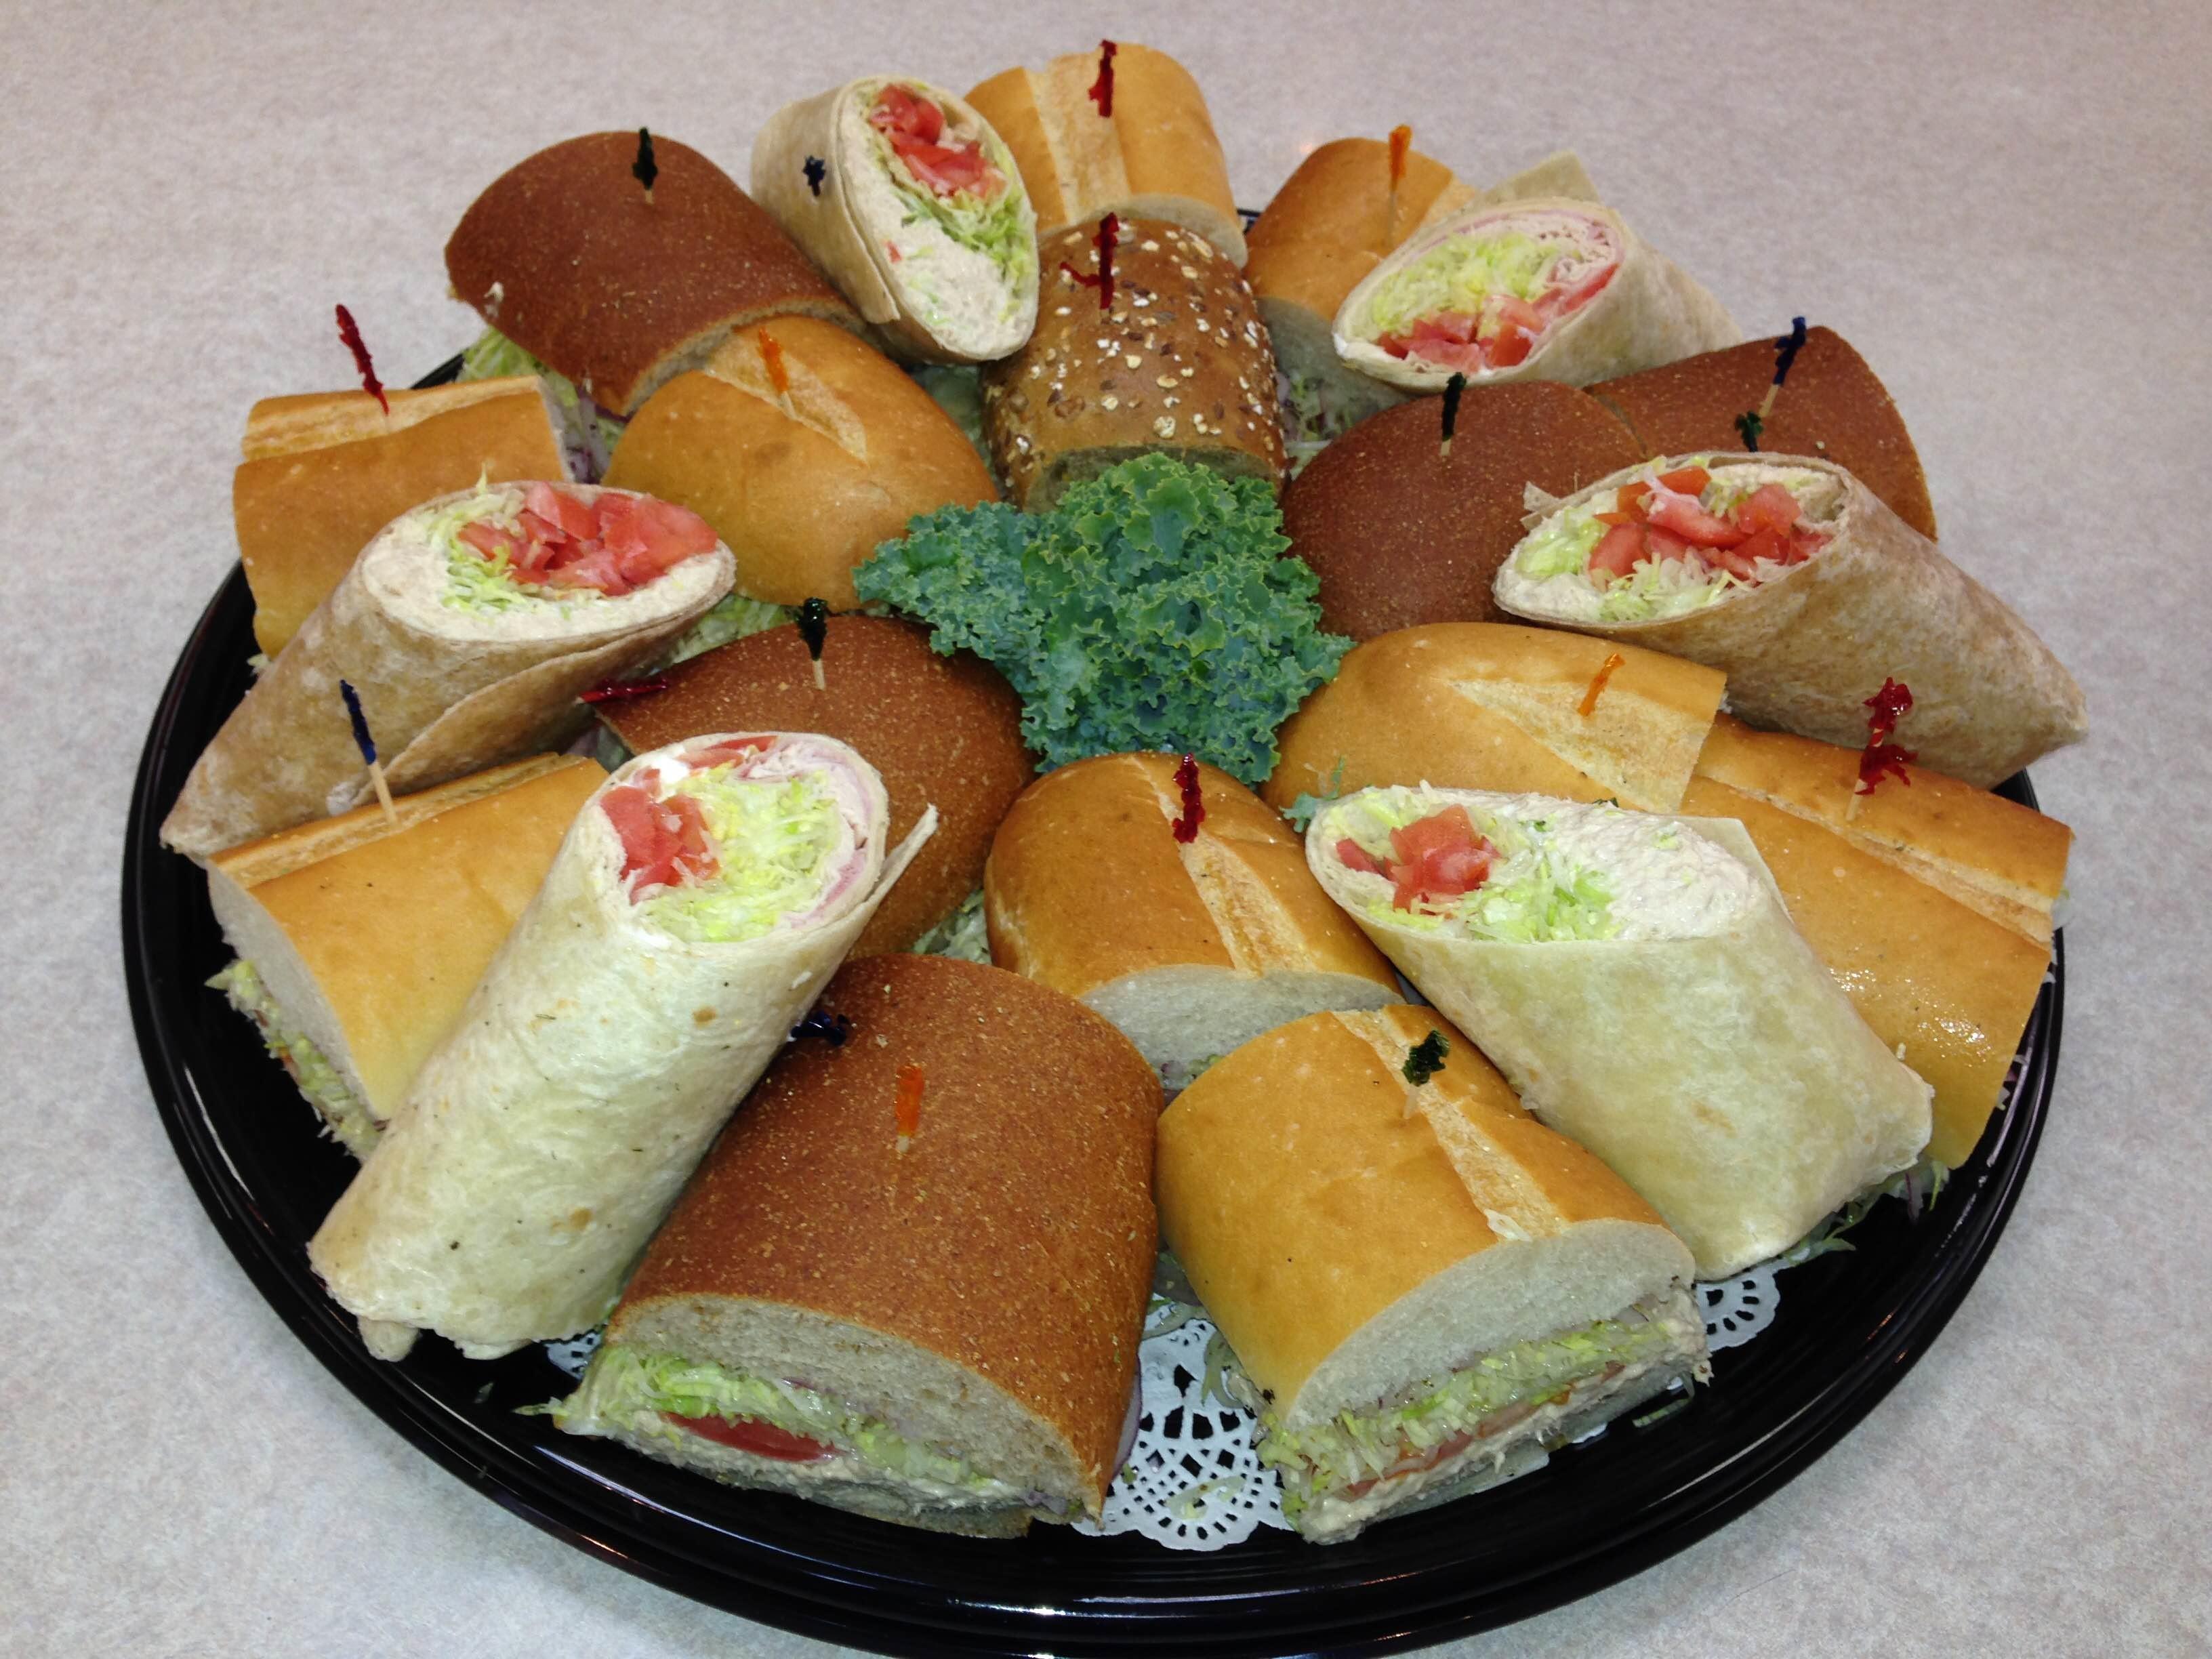 Sub & Wrap Platters